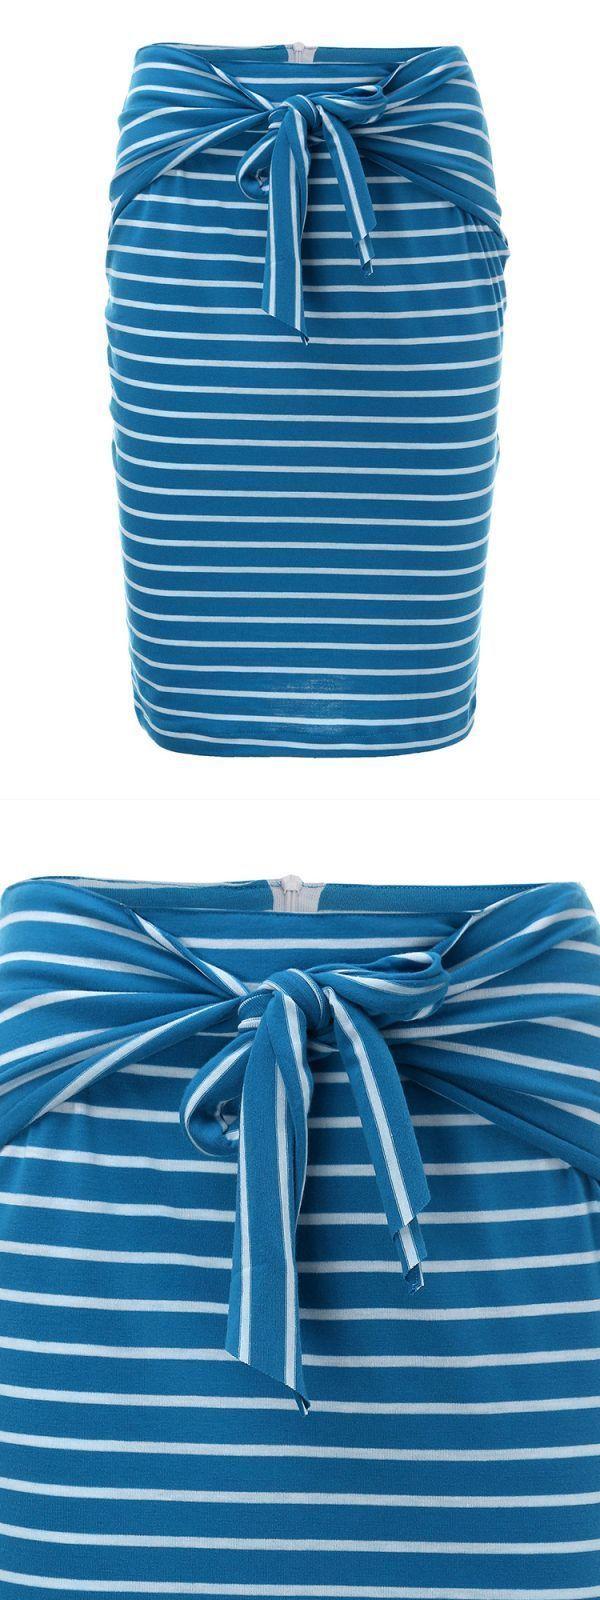 Lulu b skirts elegant women stripe bowknot midi bodycon pencil skirt #basma #k #skirts #hamp;m #skirts #2015 #kmart #bed #skirts #skirts #n #crop #tops